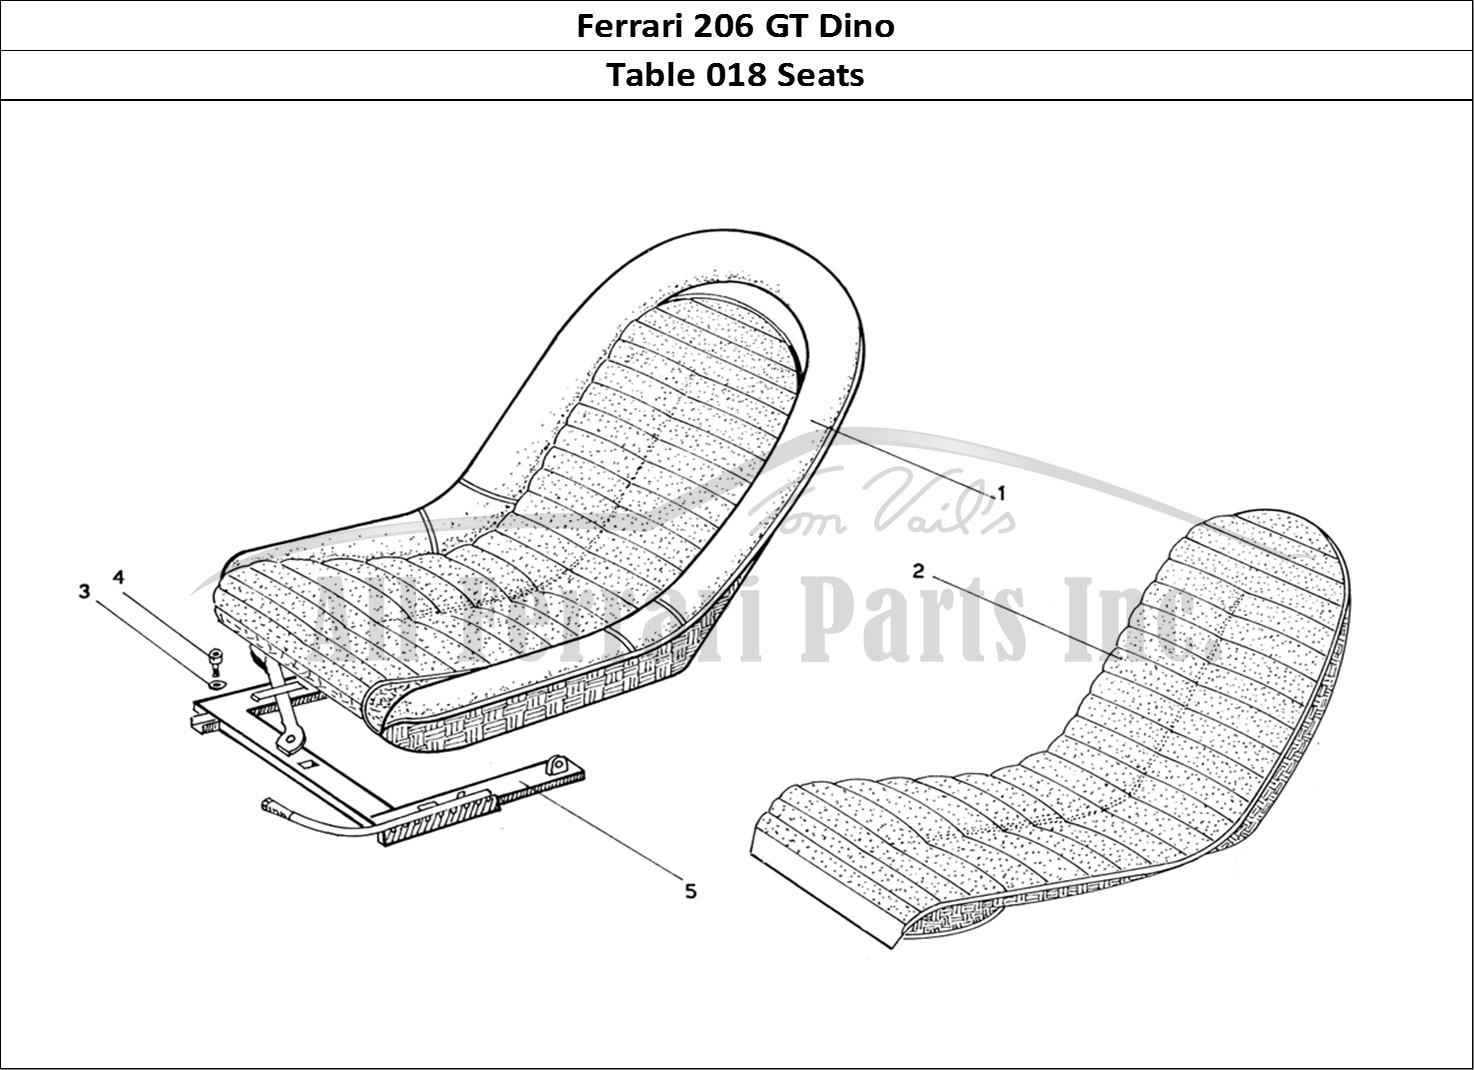 Buy original Ferrari 206 GT Dino 018 Seats Ferrari parts